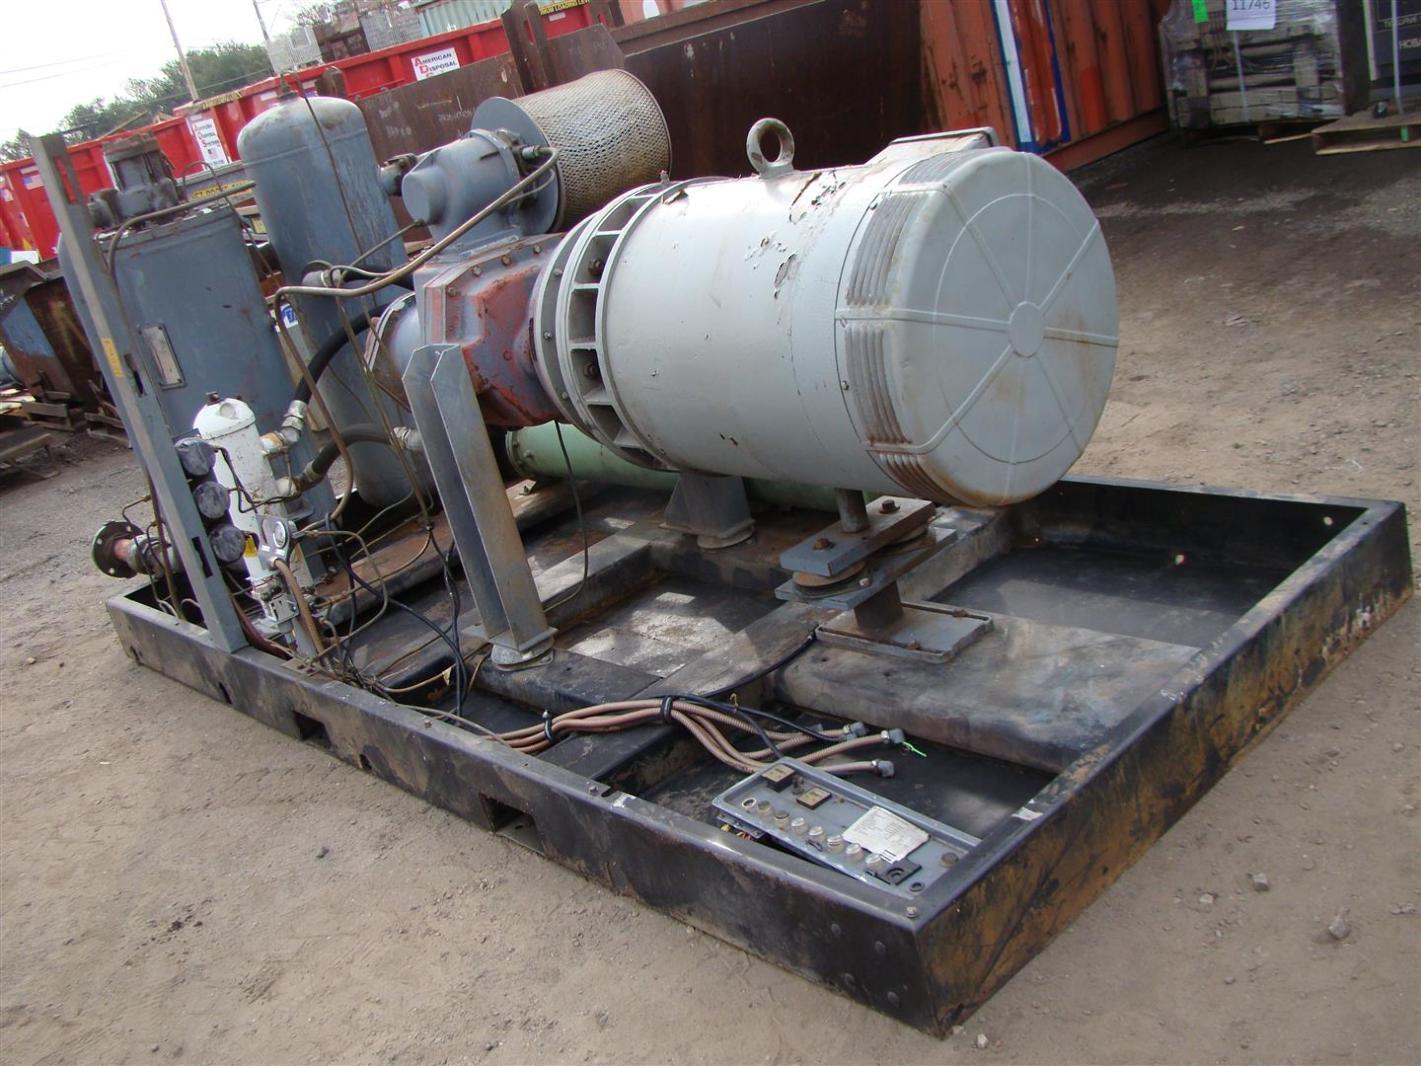 318Vn Motor//Engine: 208-230//1 Two Stage H318Vn Lbs. Wt. Tank: 80V : 432 100 Psi: 18.50 Cfm Displ.: 22.43 Atlas Copco Compressors H.P.: 5.0